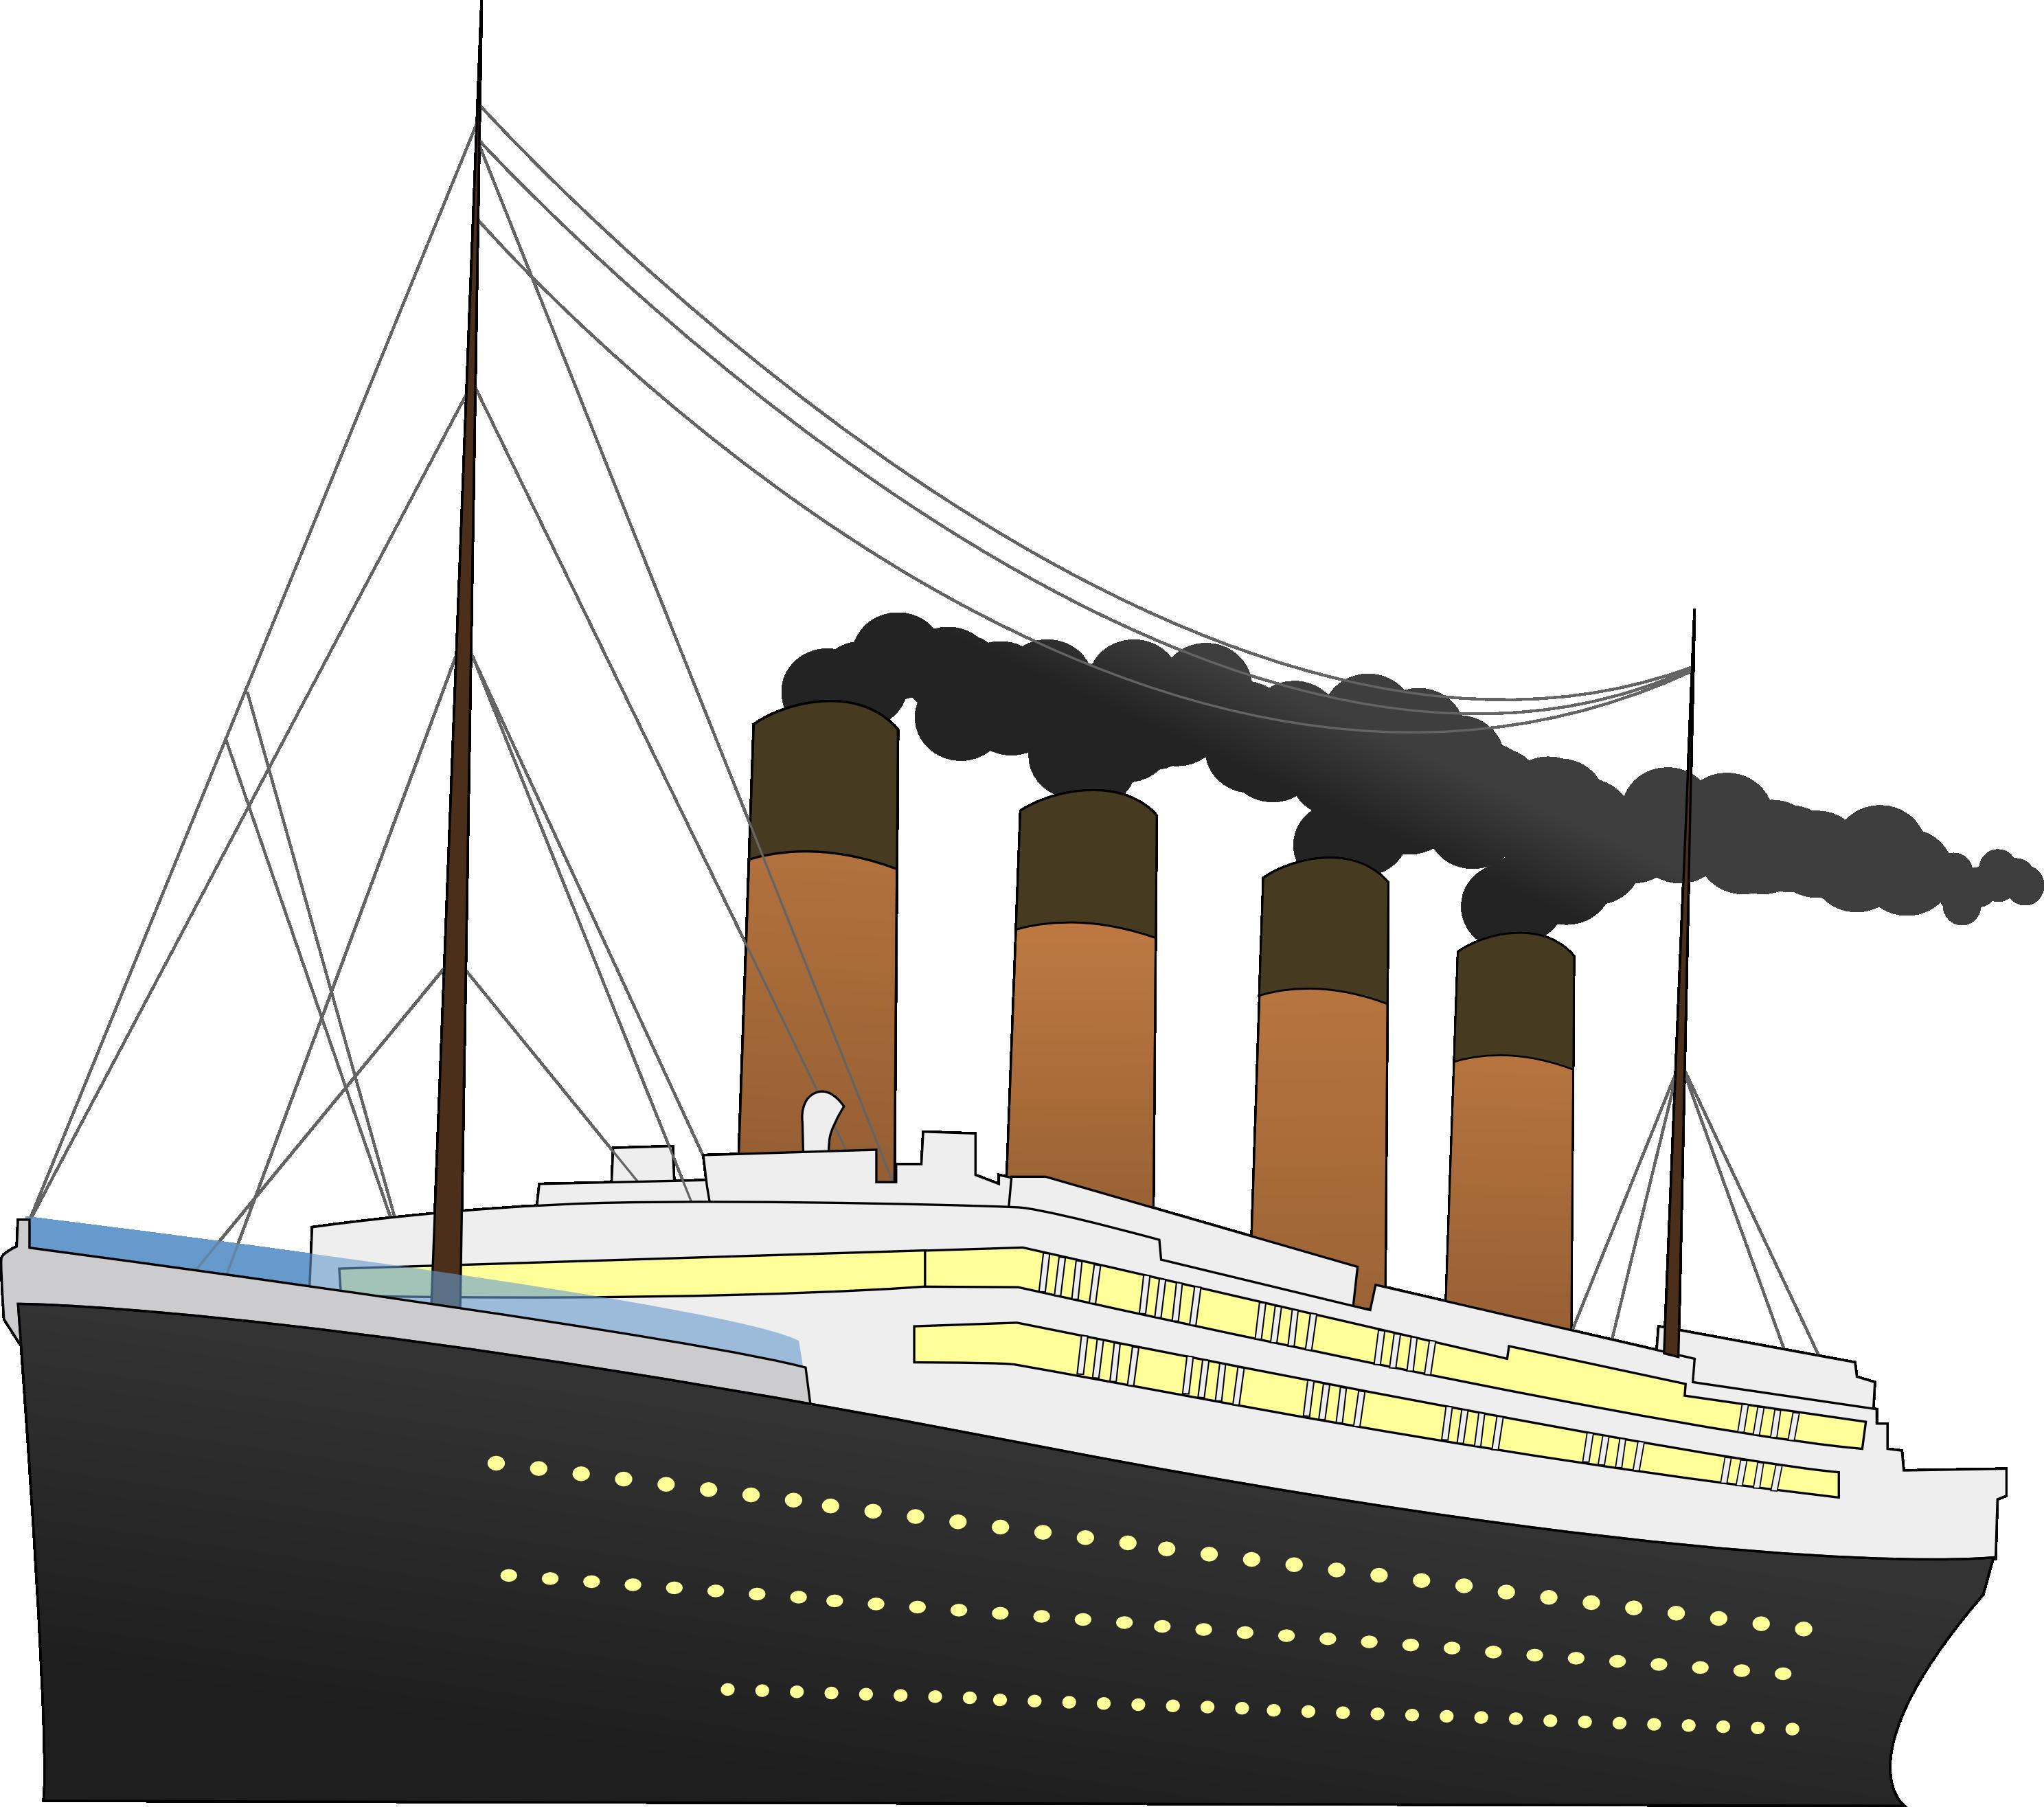 Ship Clipart & Ship Clip Art Images.